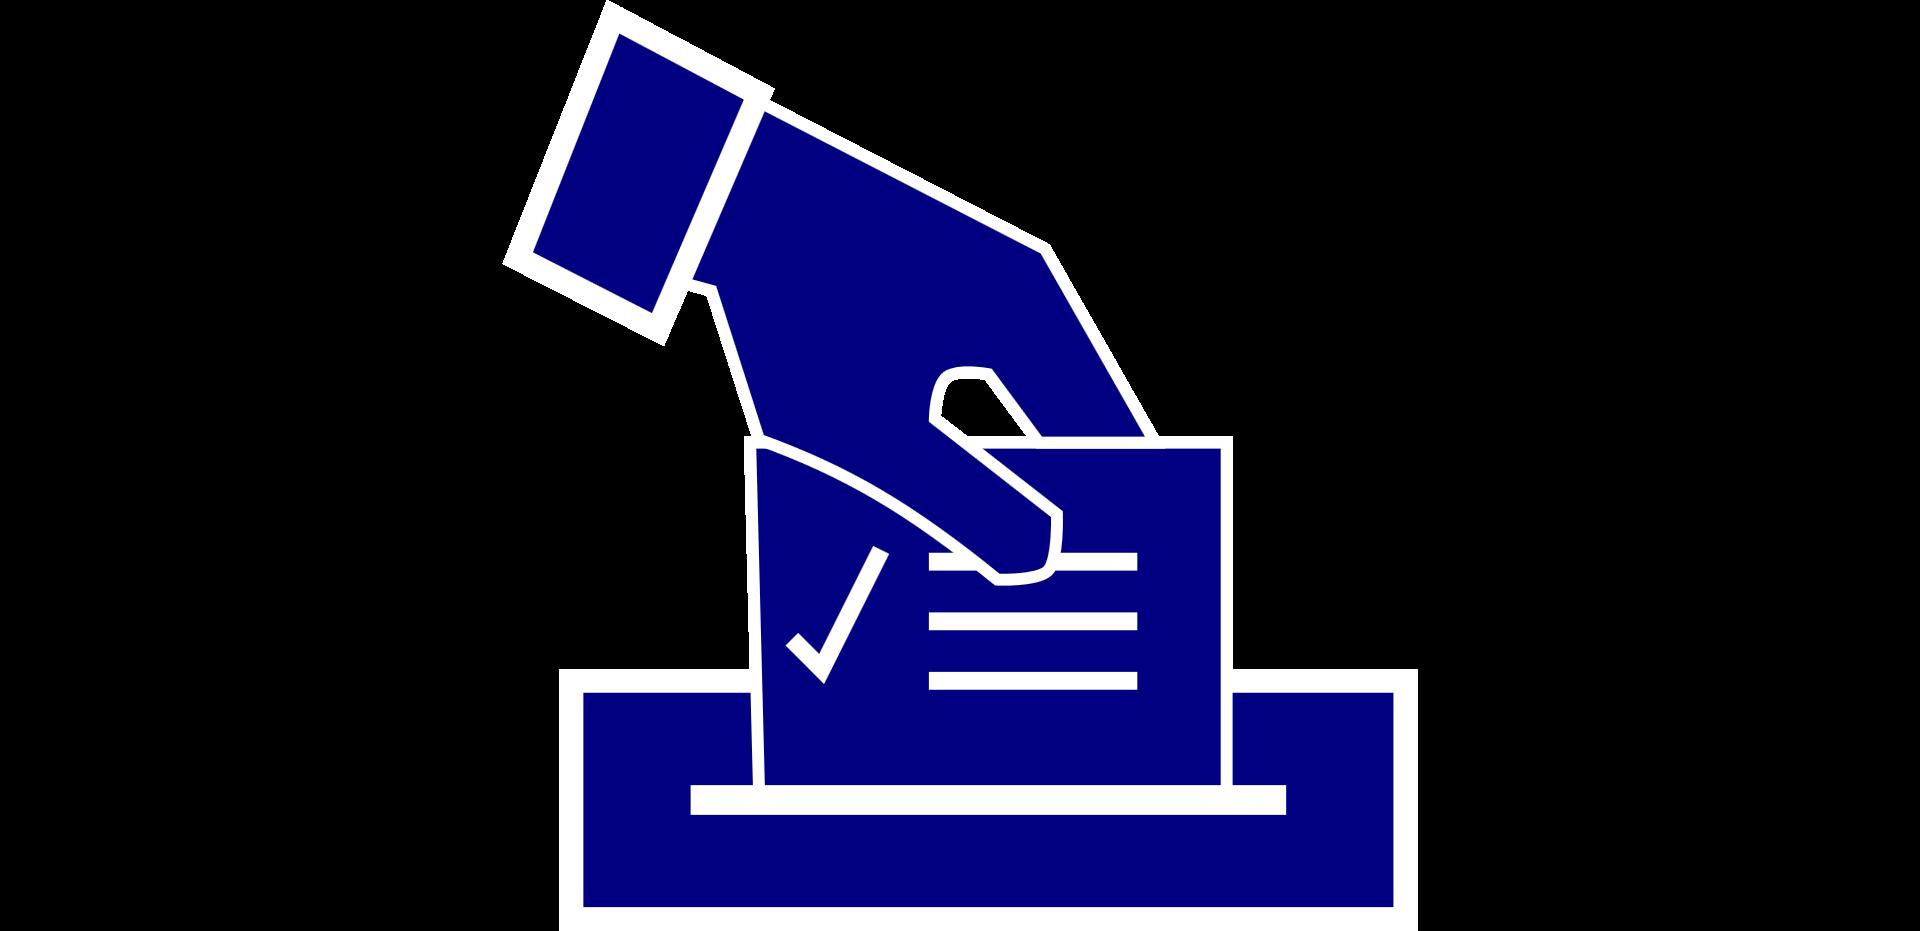 1920x931 Vote Clipart Transparent